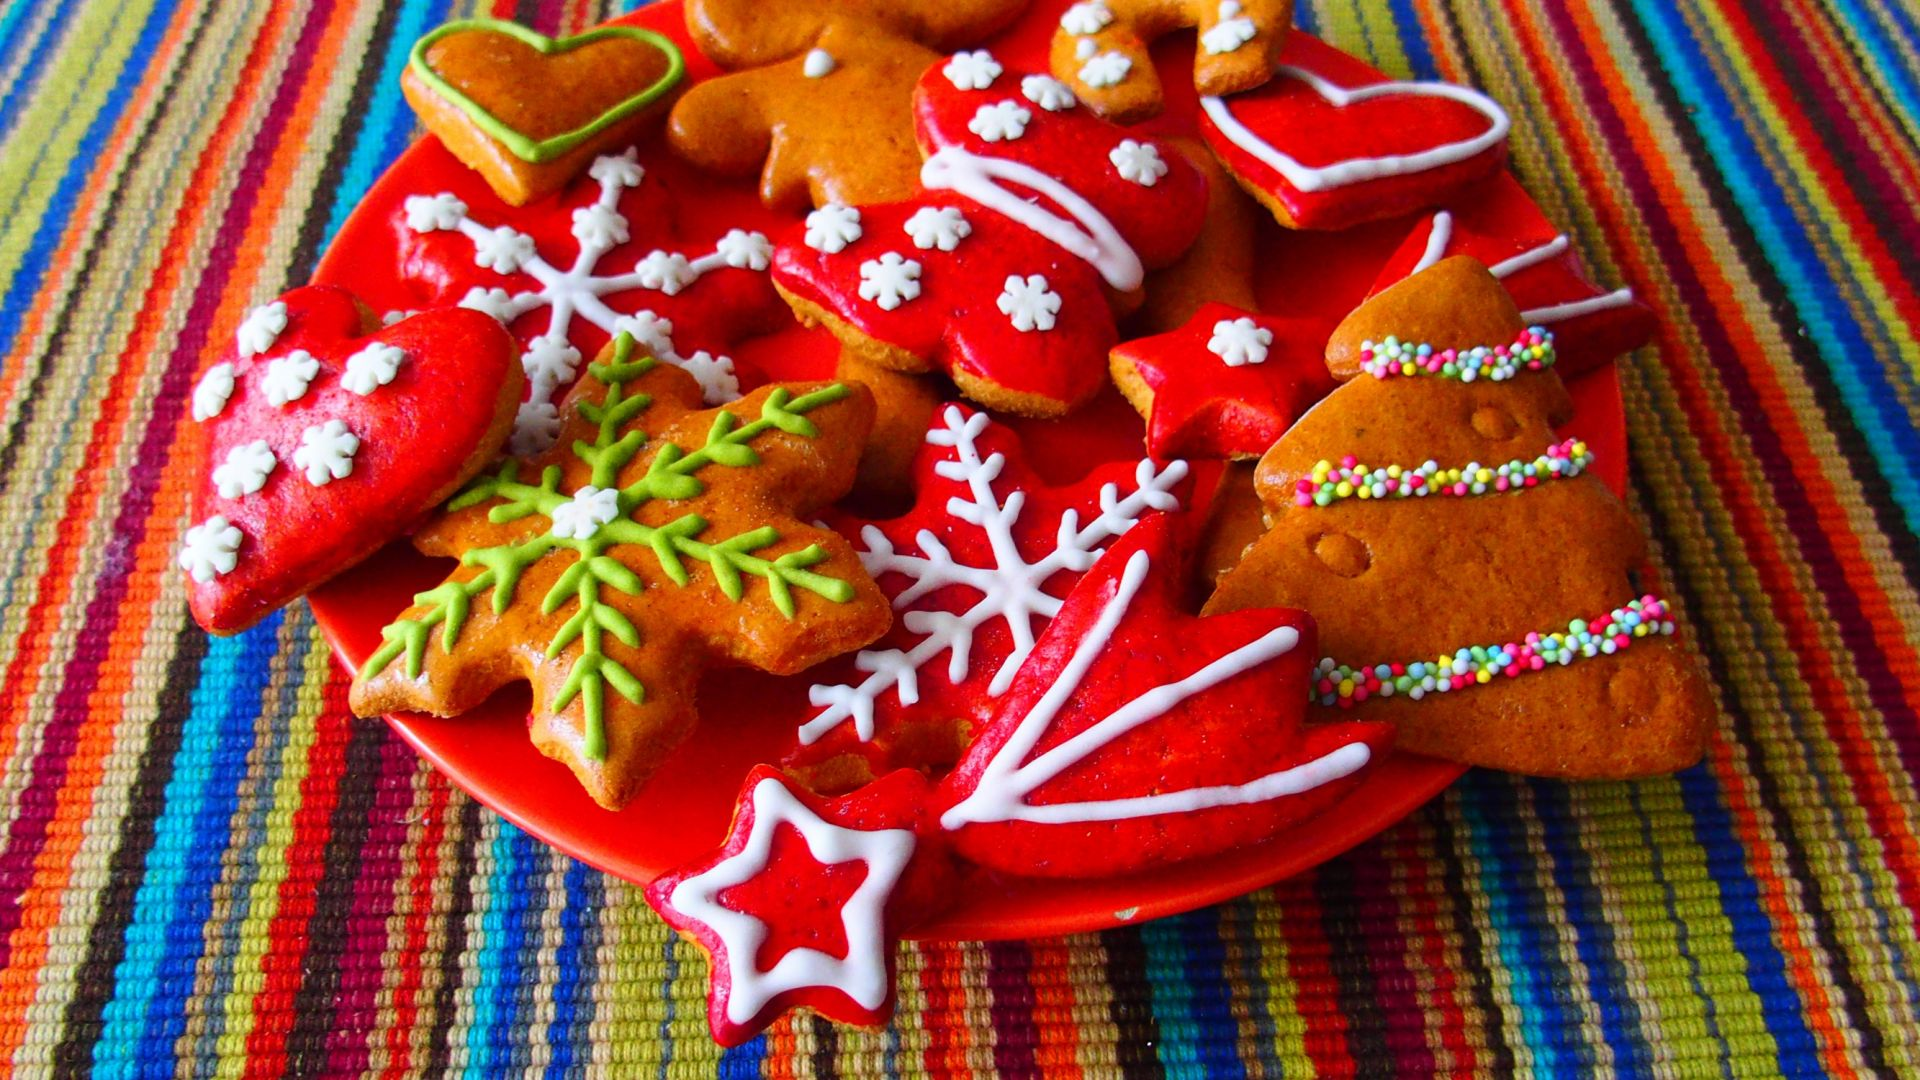 Christmas Cookies Wallpaper.Desktop Wallpaper Christmas Cookies Hd Image Picture